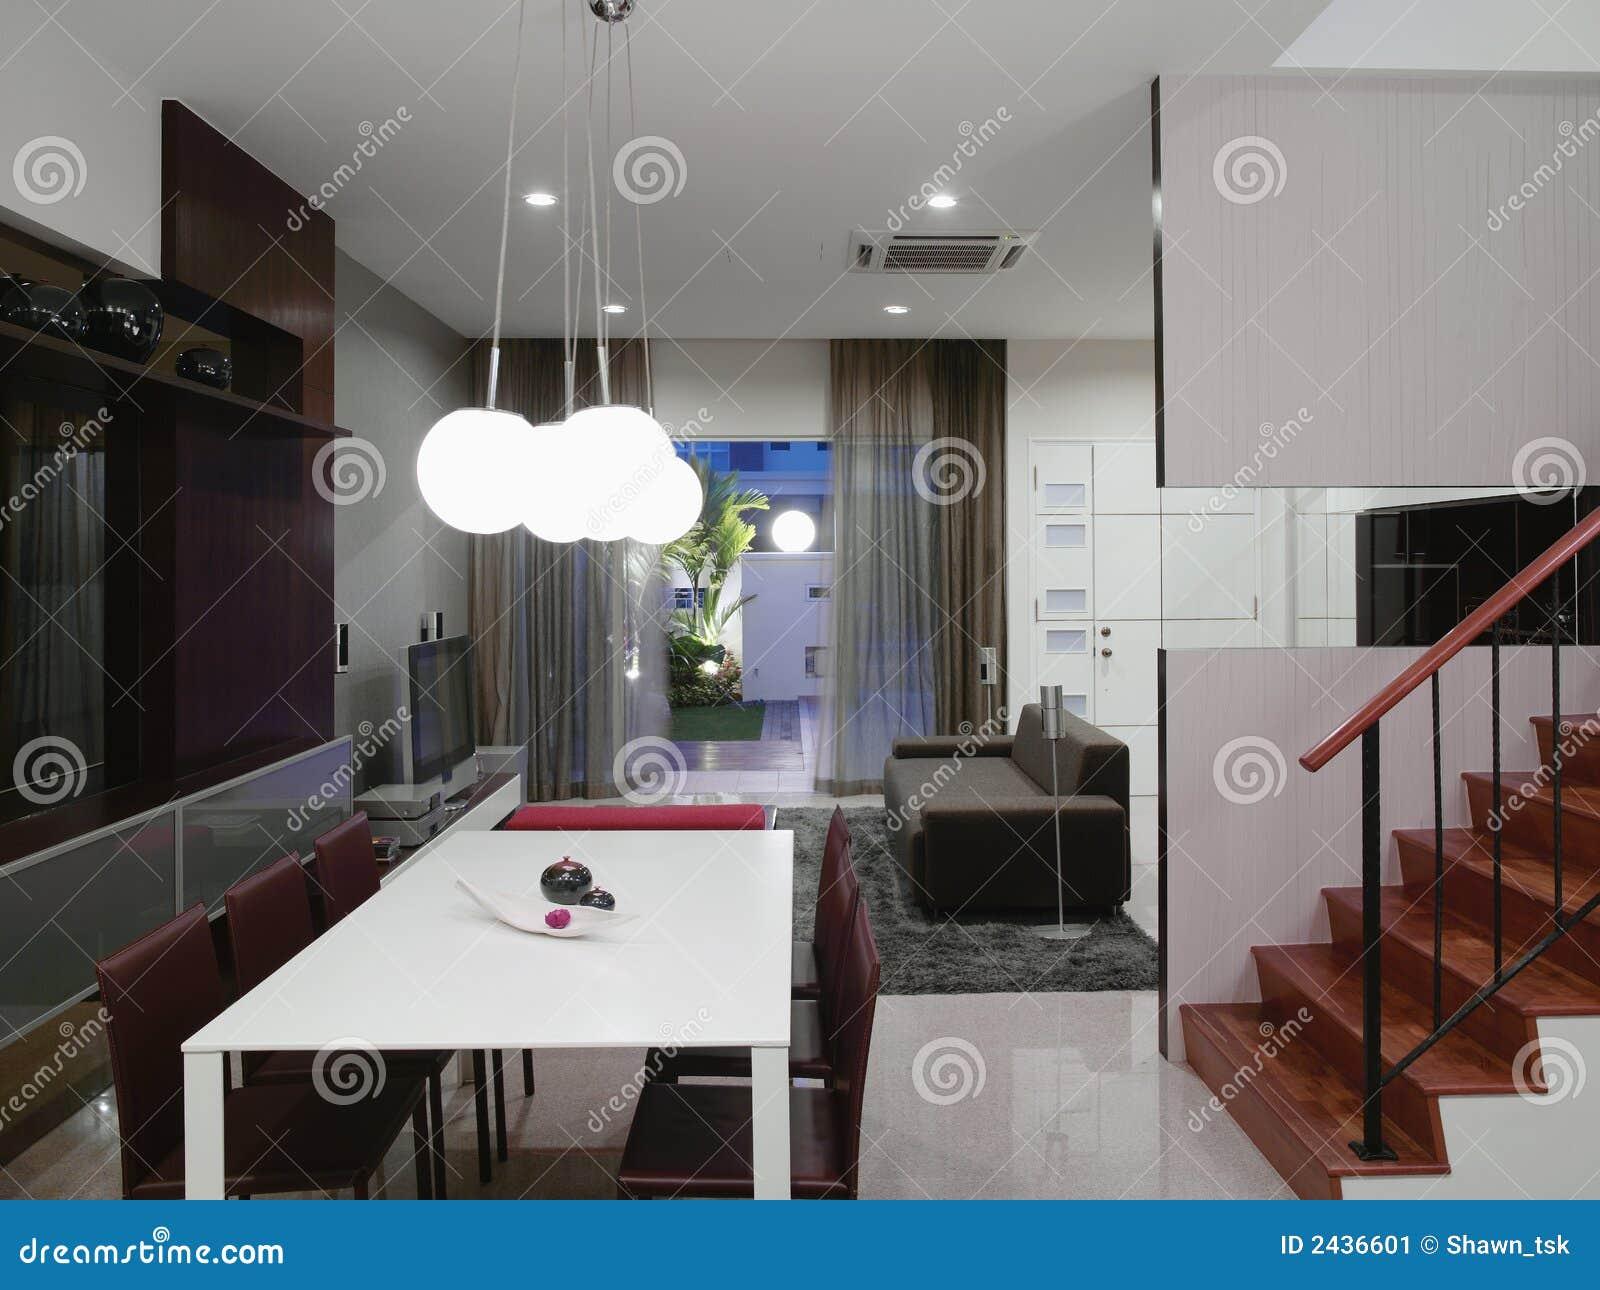 Dining area interior design seligat wallpaper for Dining area design